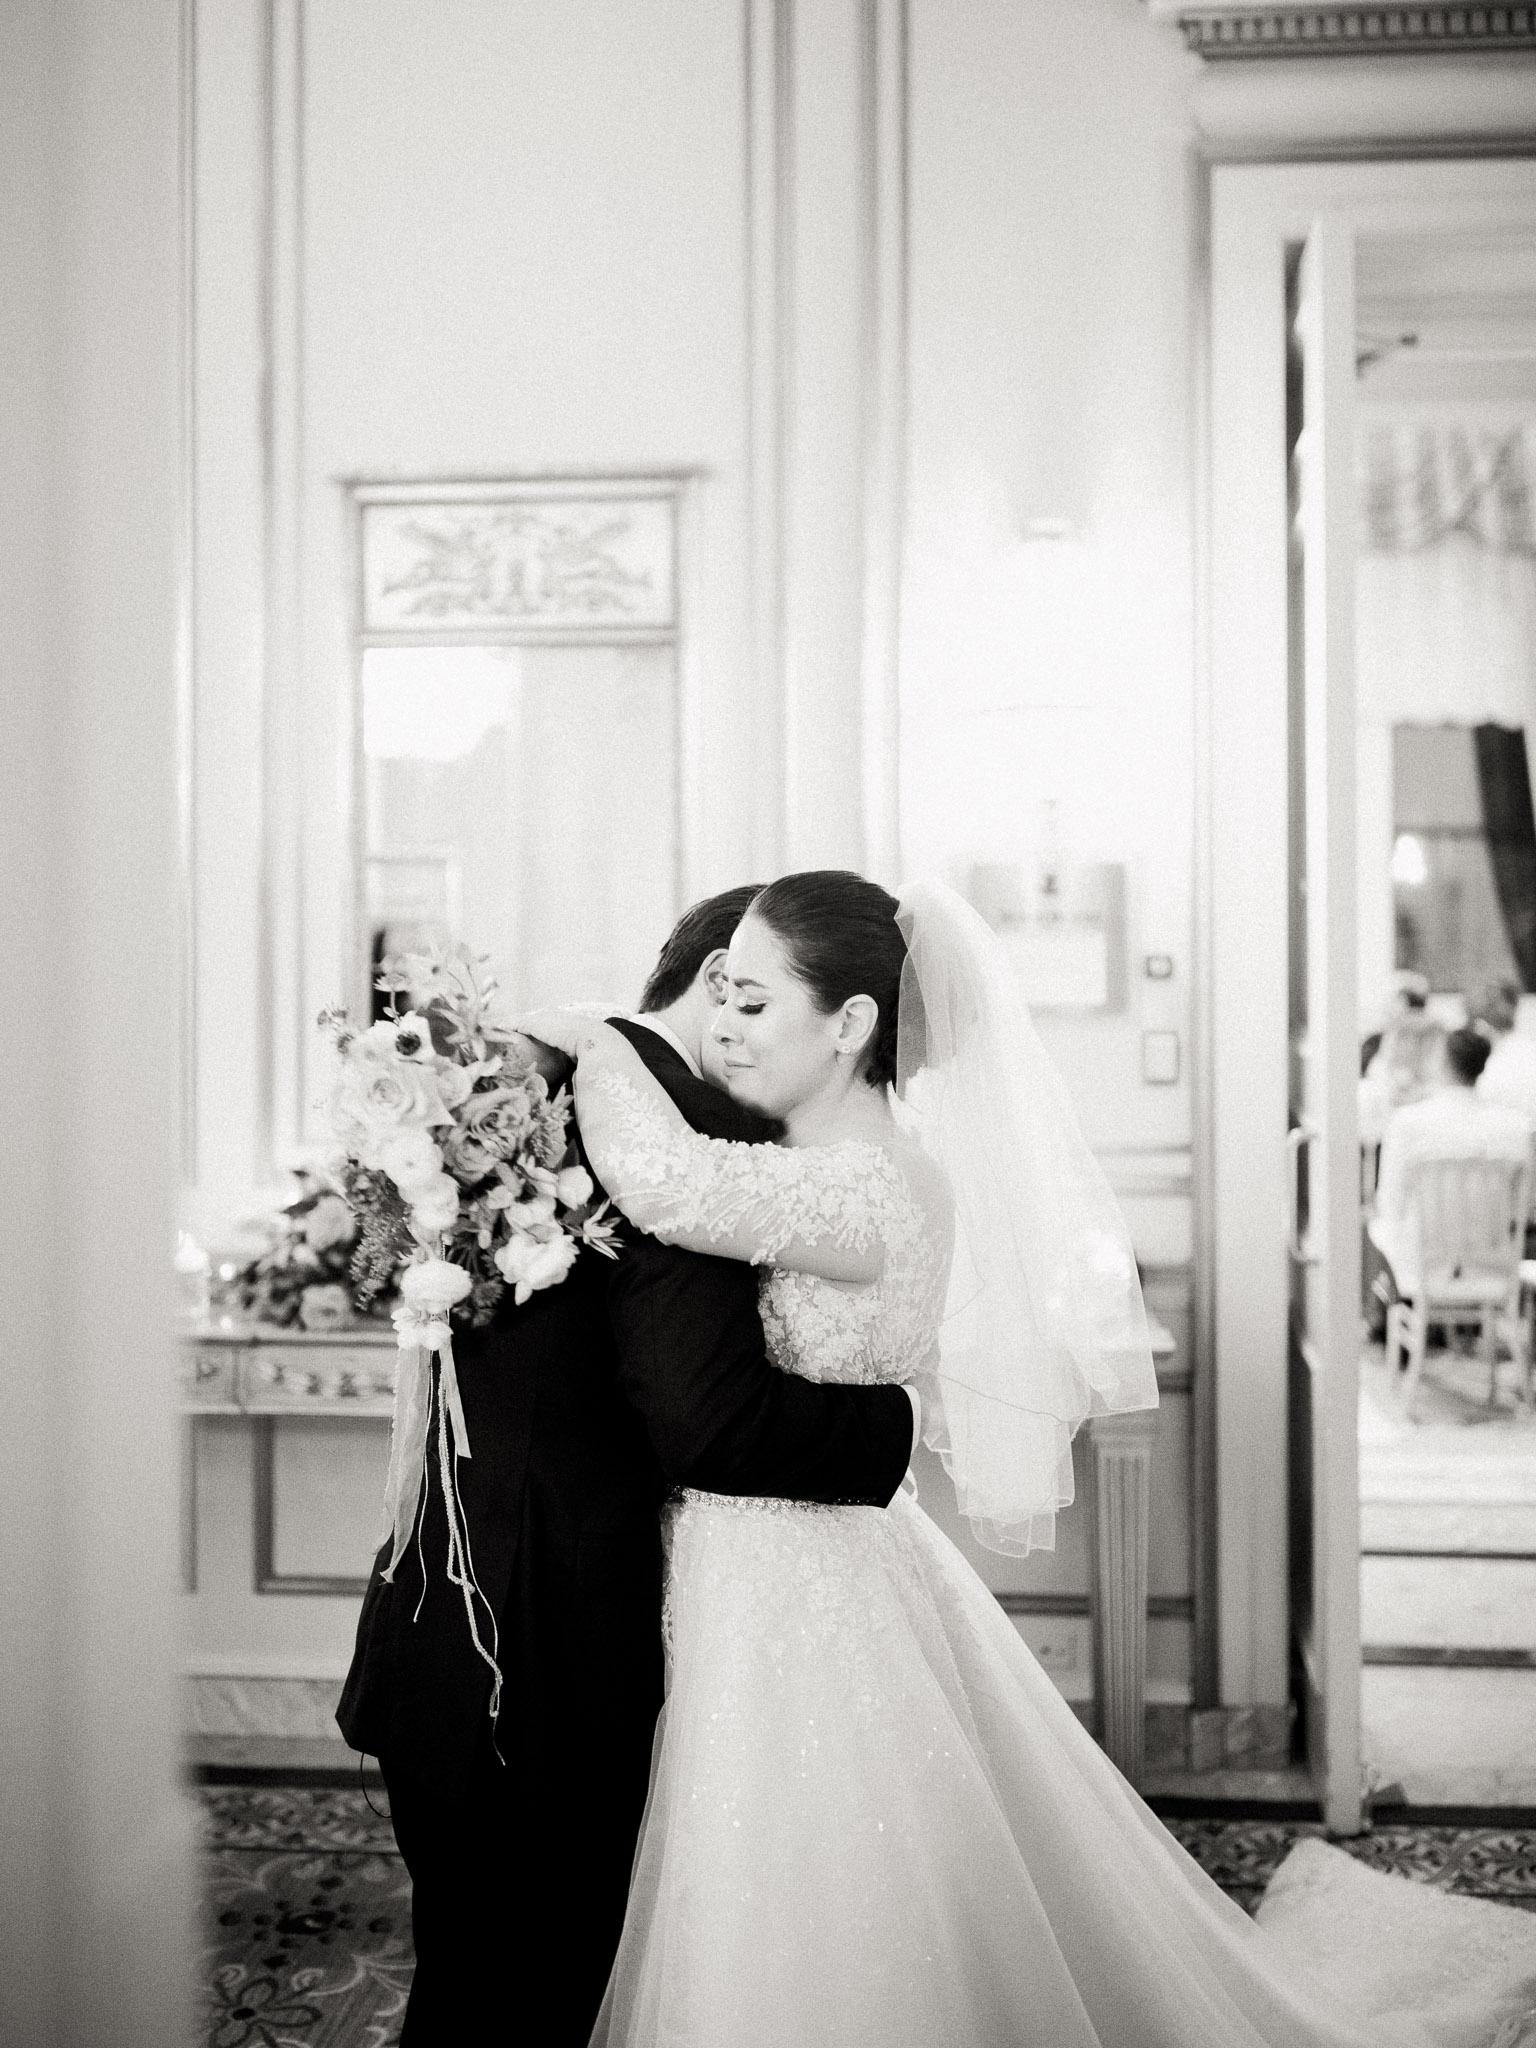 Hanna&Jordan Wedding_HotelVancouver_9378.jpg